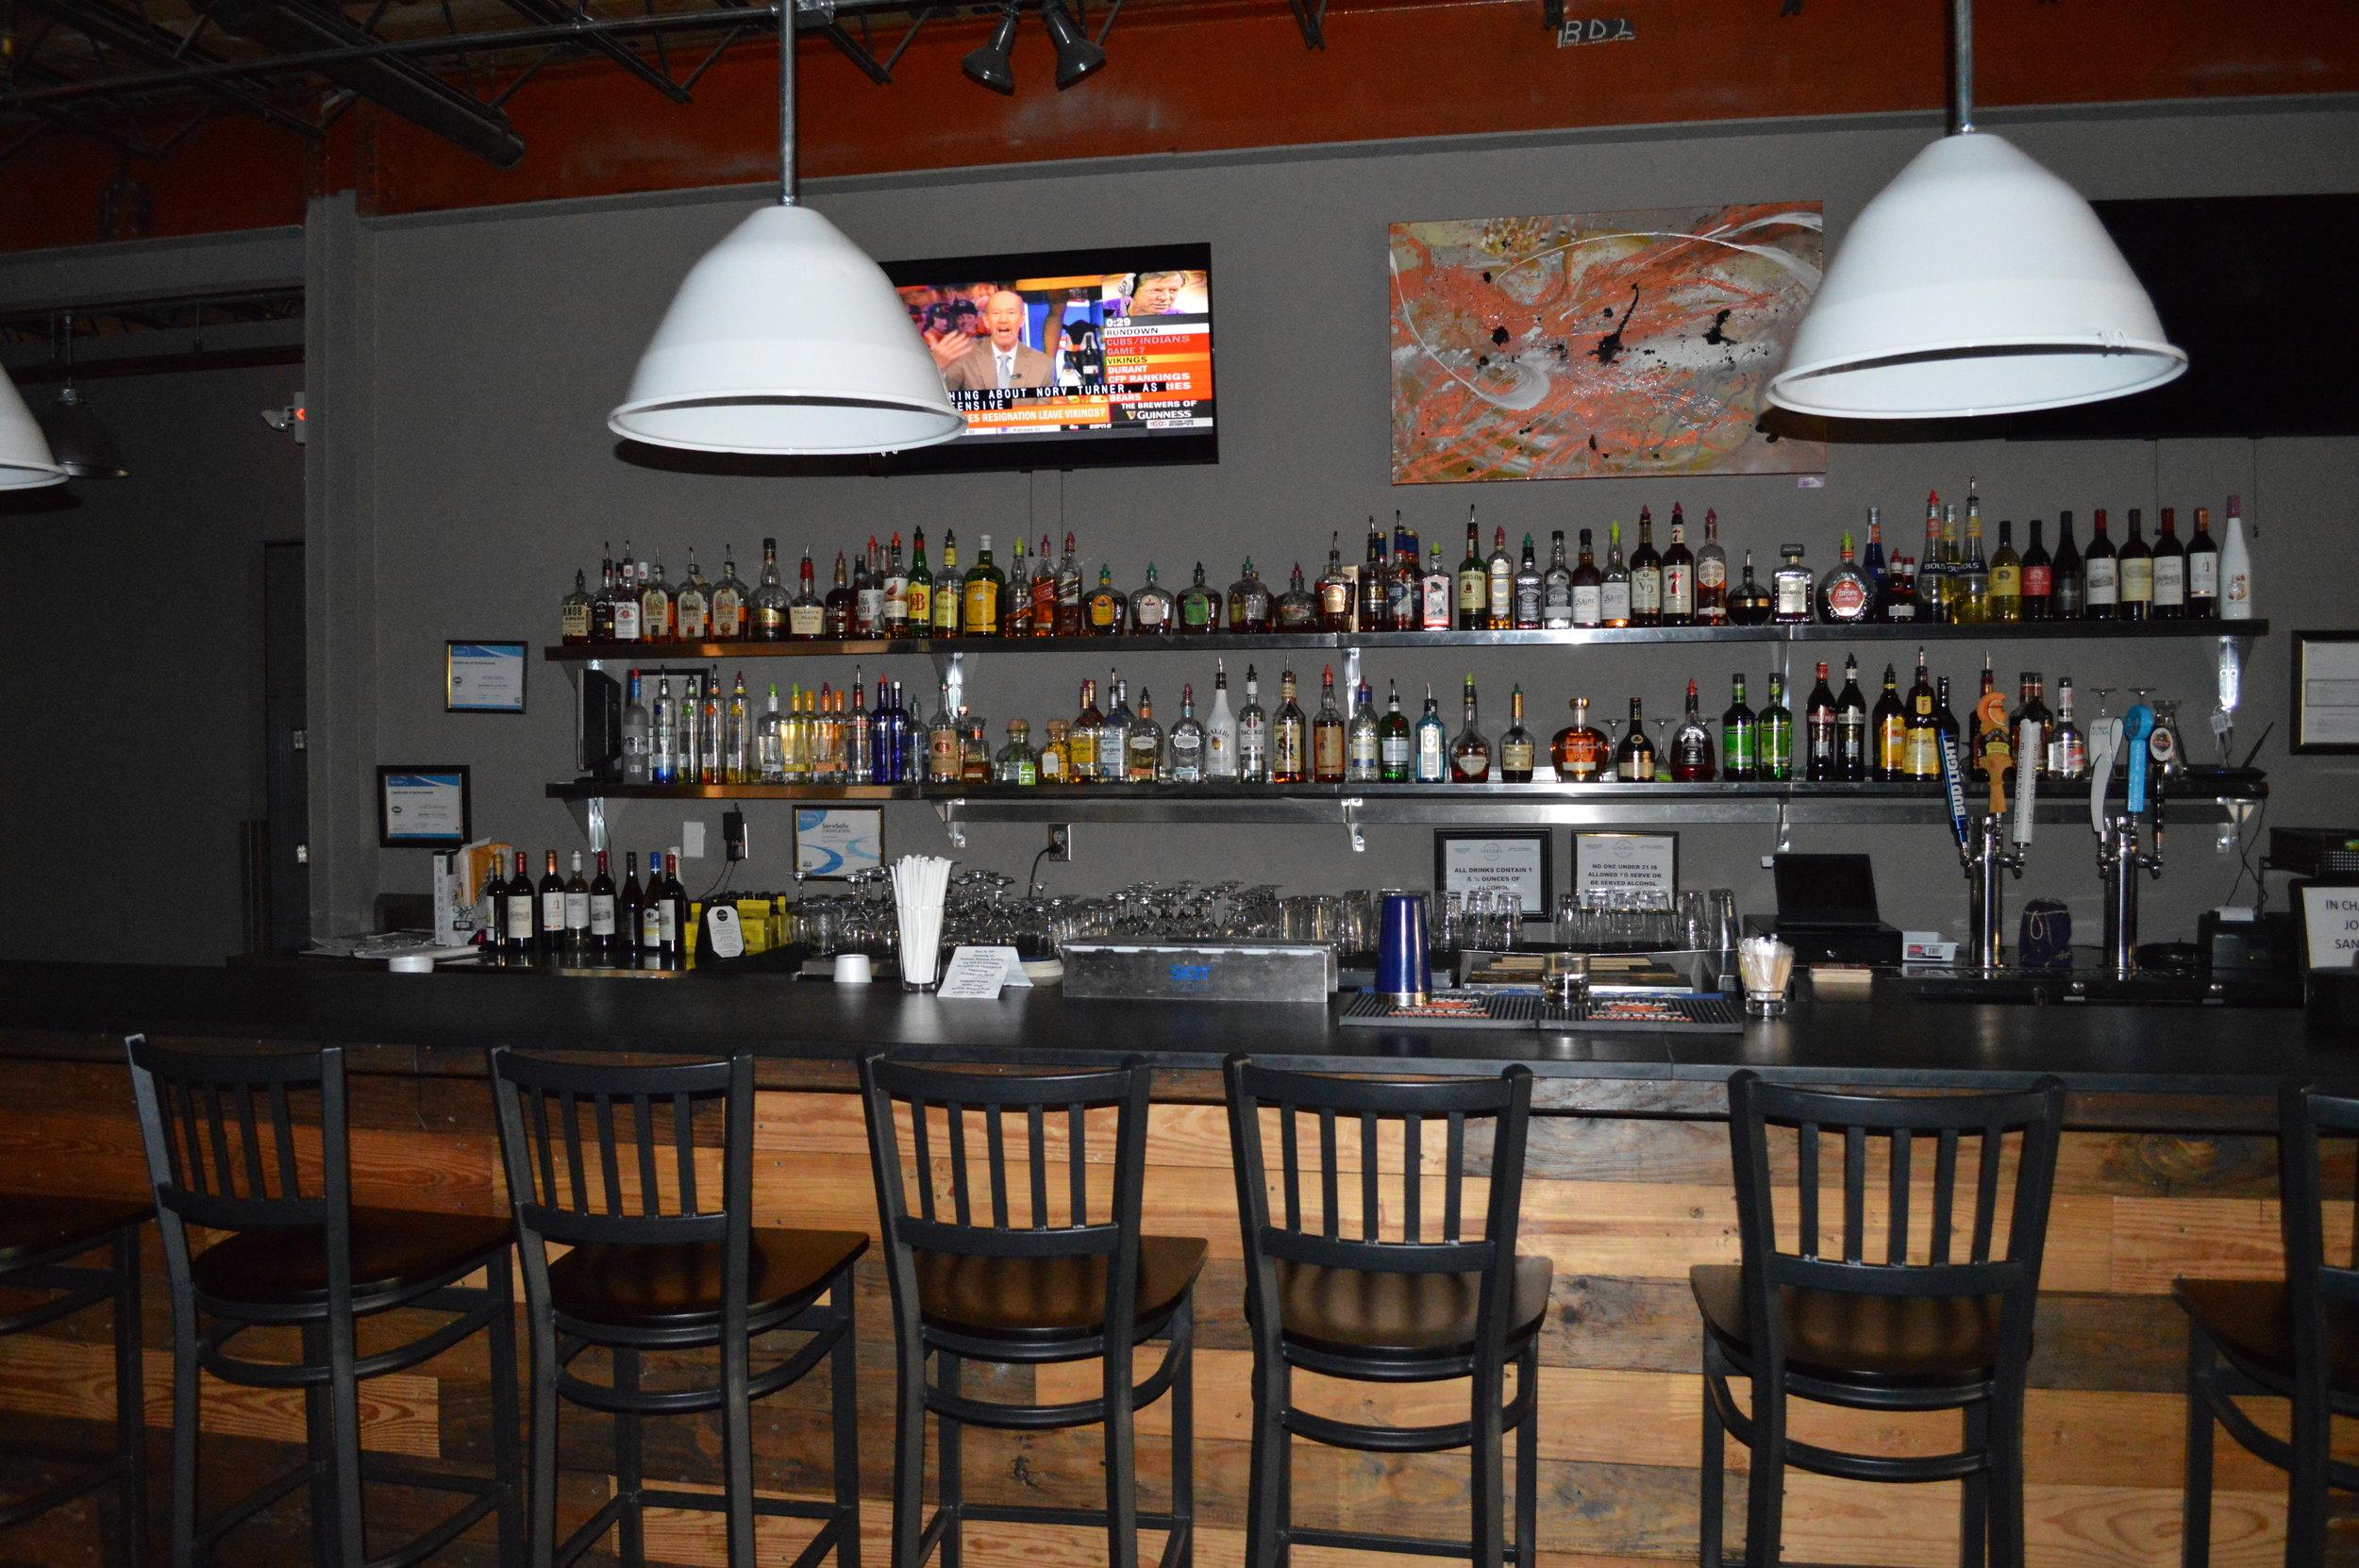 Collier's Bar